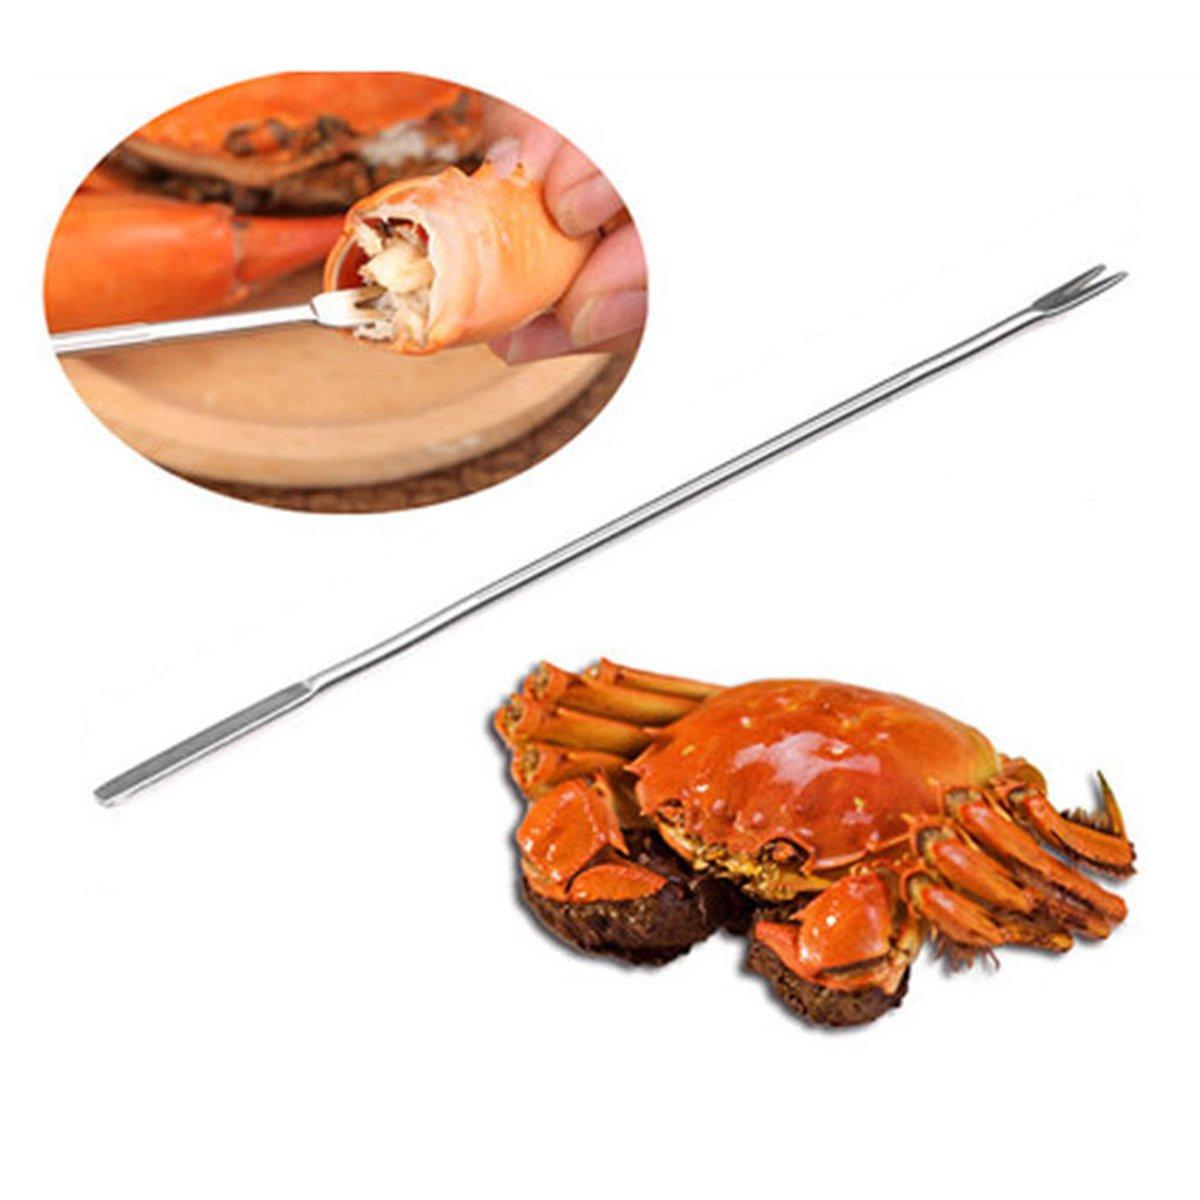 Justdolife Crab Forks Seafood Tool Multifunctional Crab Lobster Nut Fork Pick Kitchen Tool Kitchen Gadget